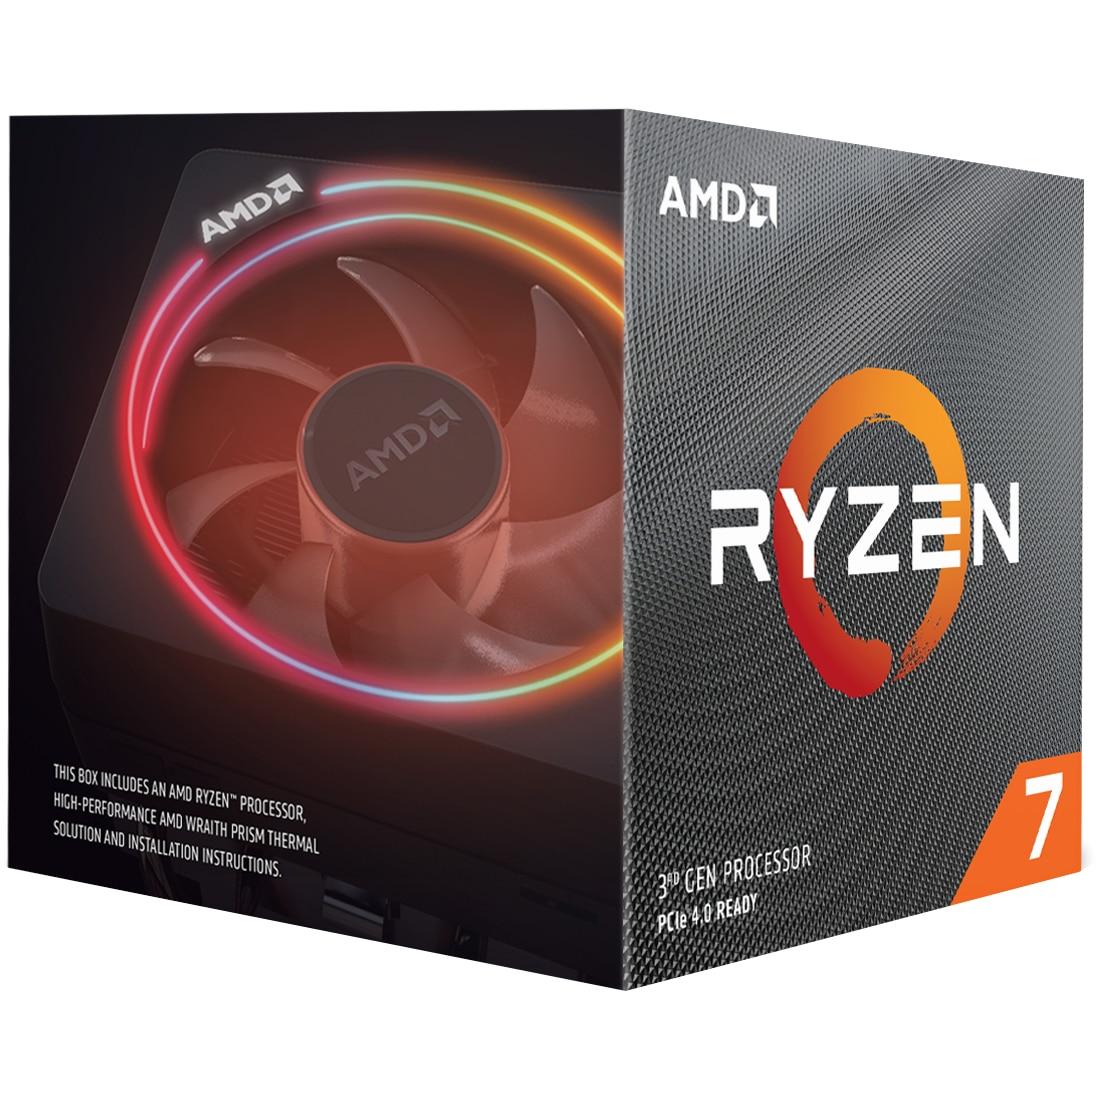 Fotografie Procesor AMD Ryzen™ 7 3700X, 36MB, 4.4 GHz cu Wraith Prism cooler